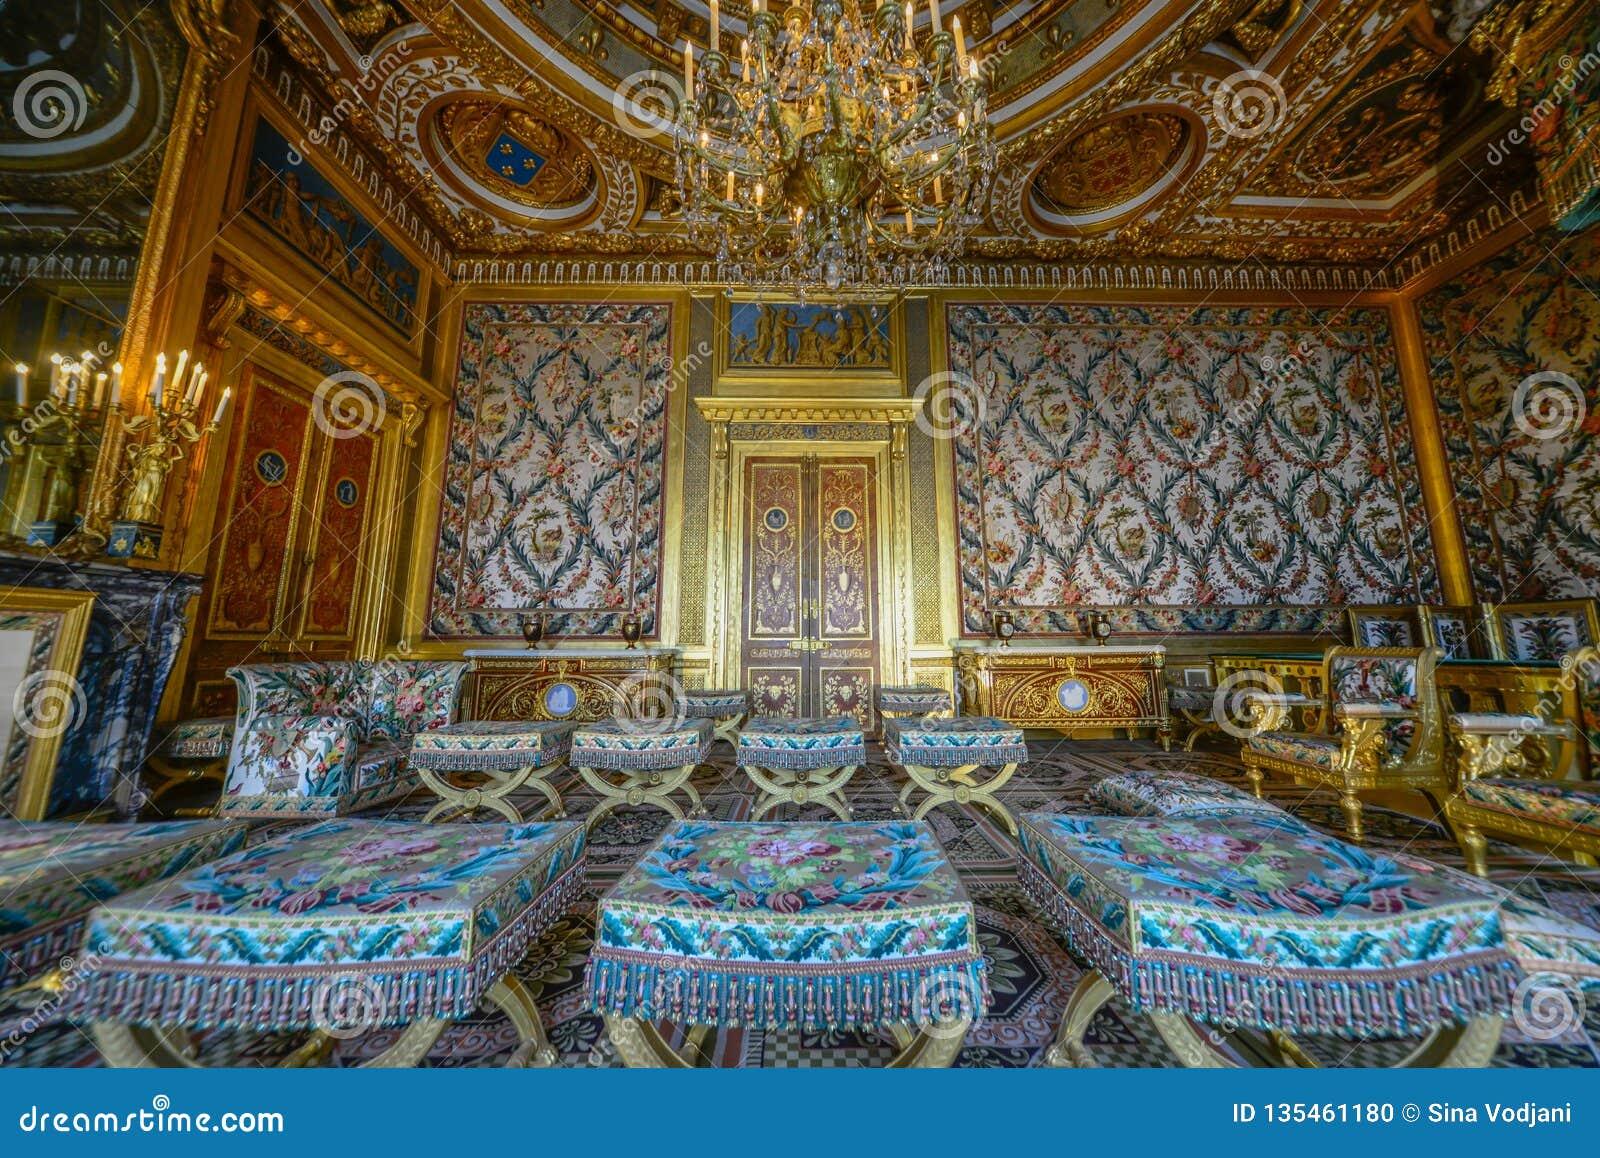 Королевская комната внутри дворца fontainbleau